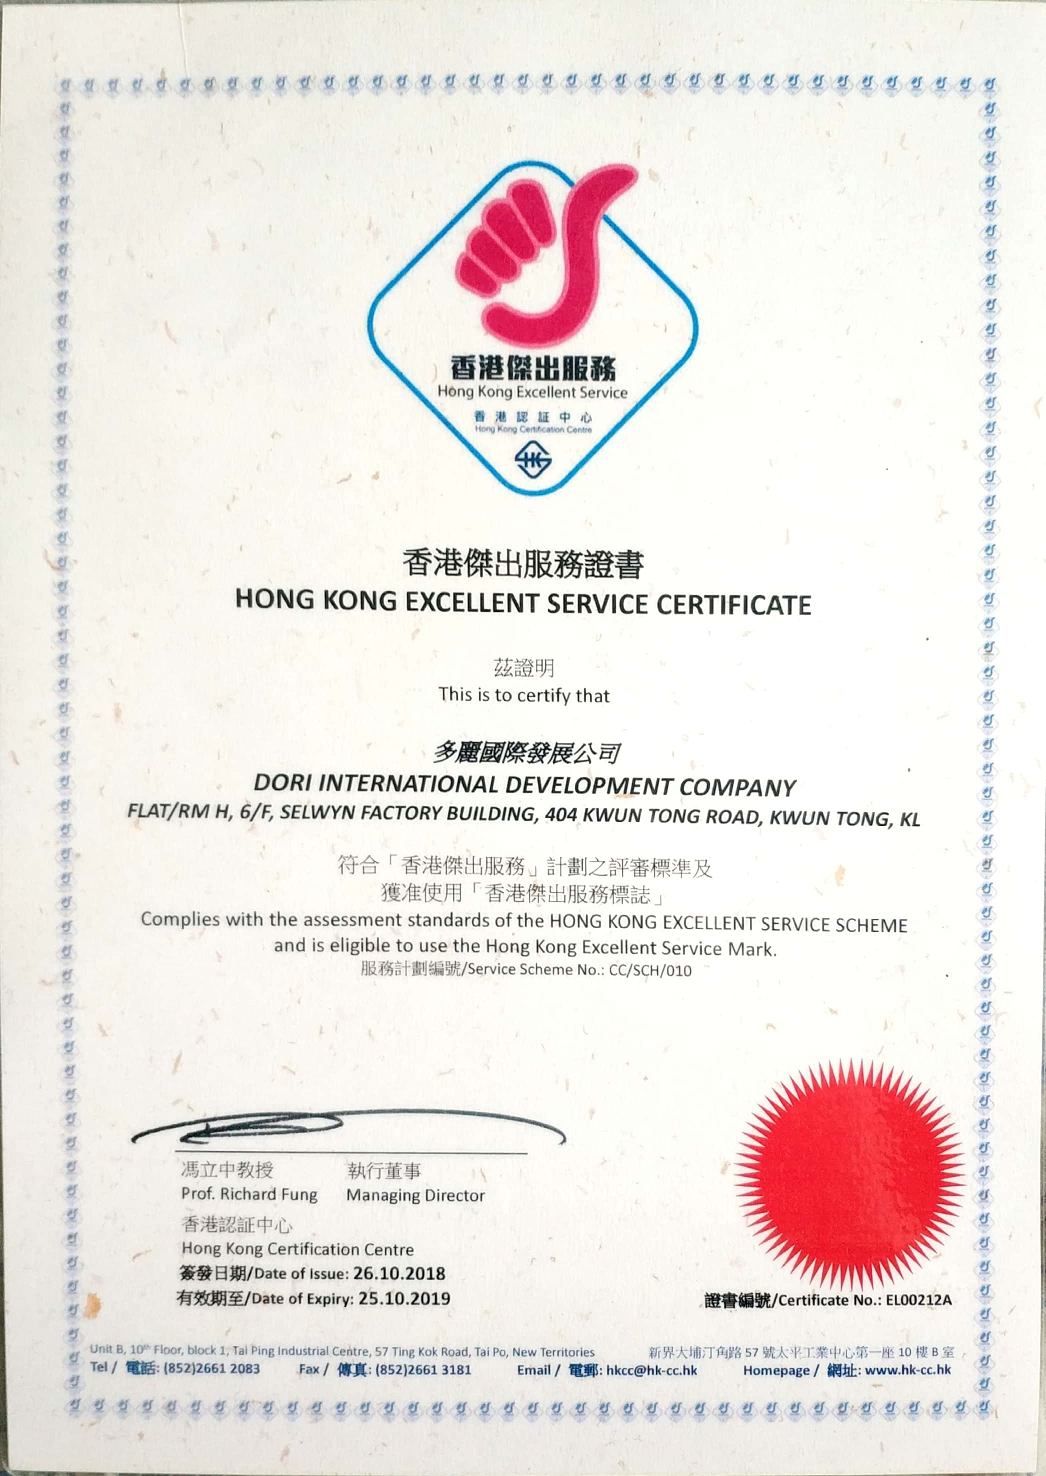 HONG KONG EXCELLENT SERVICE CERTIFICATE《香港傑出服務證書》